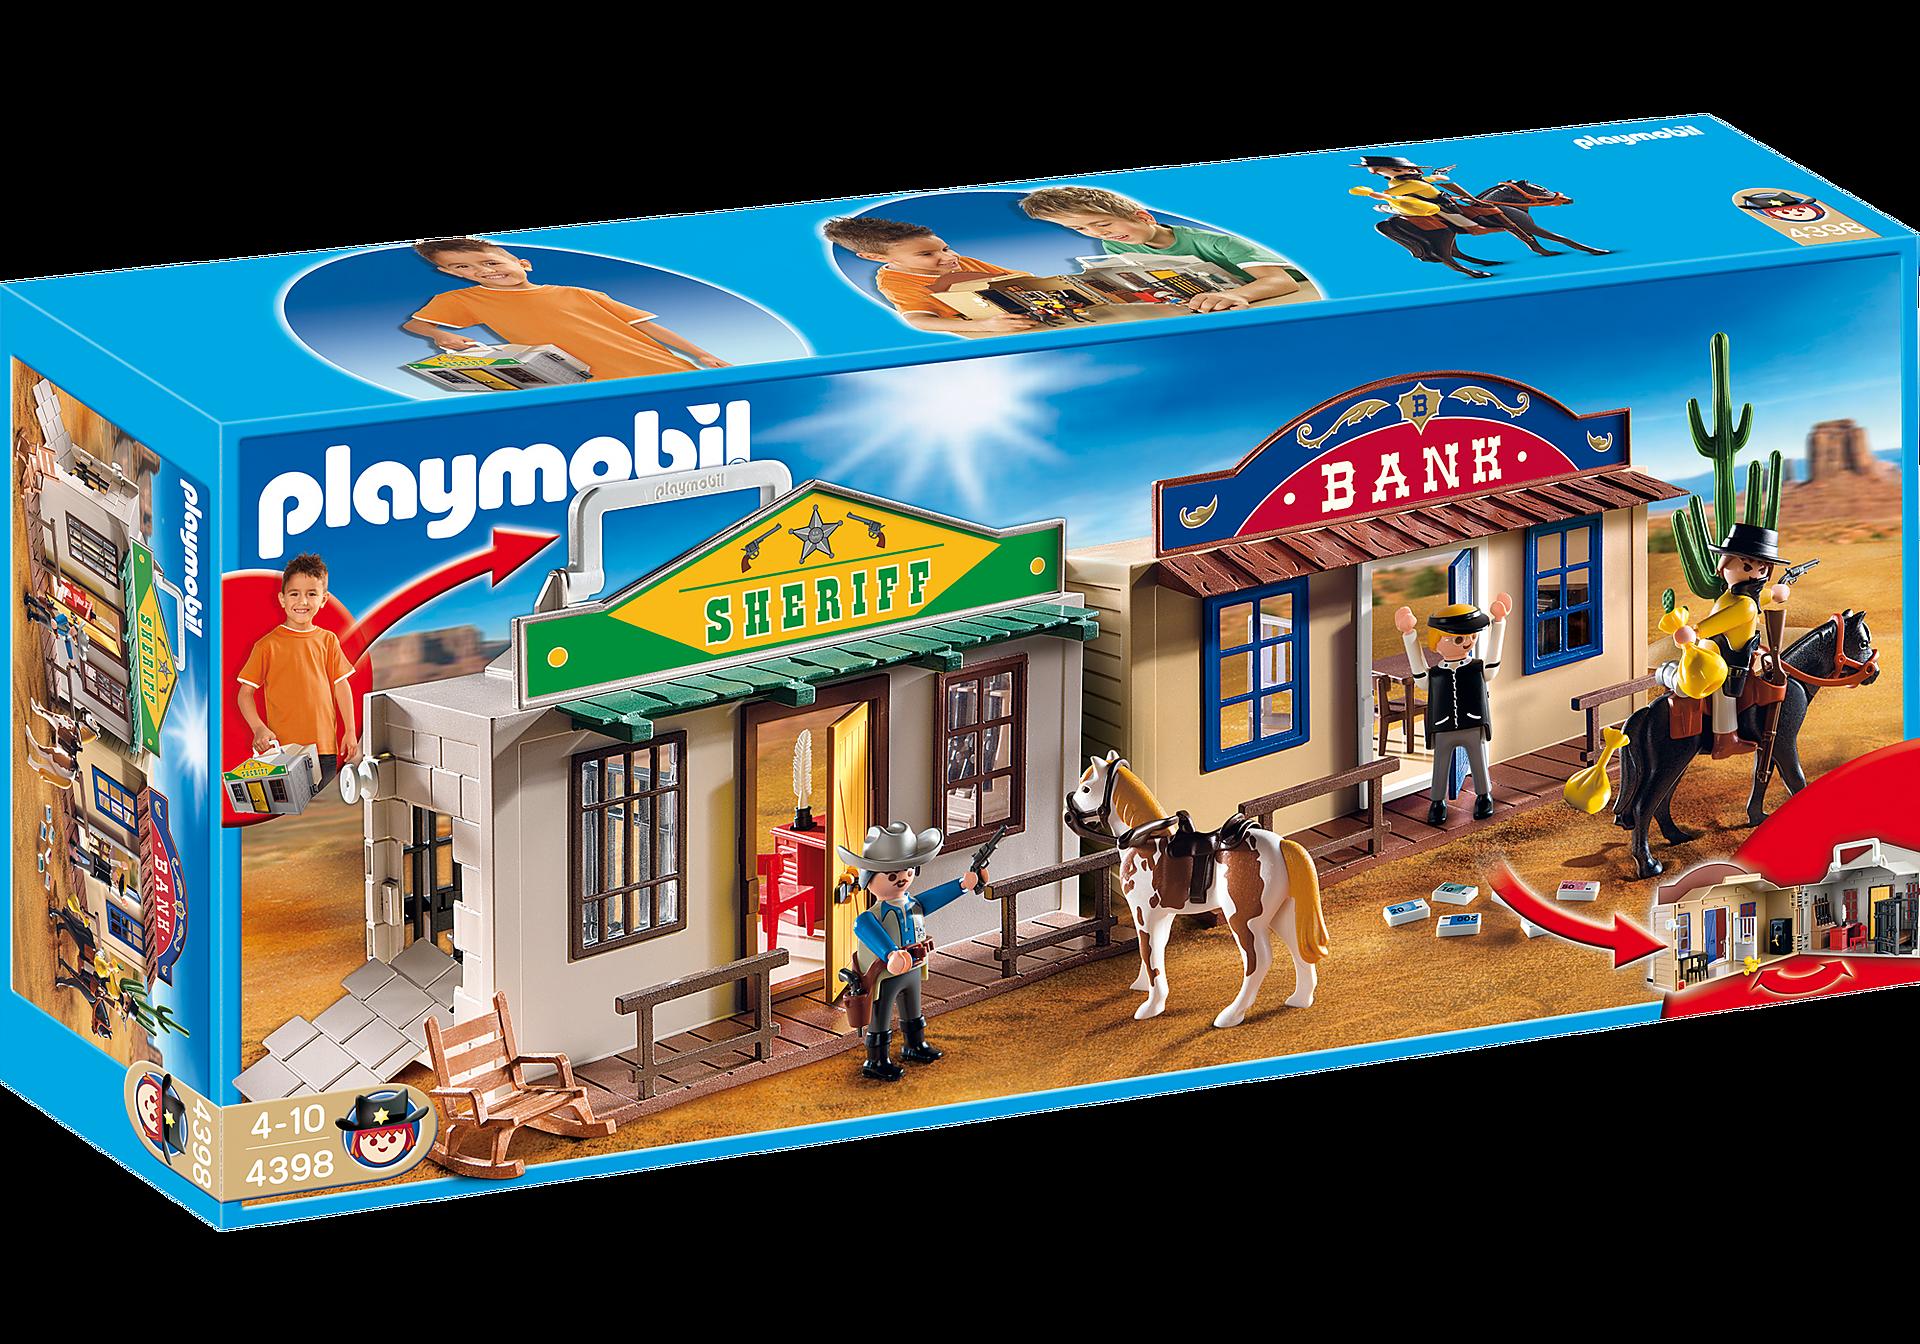 http://media.playmobil.com/i/playmobil/4398_product_box_front/Mitnehm-WesternCity